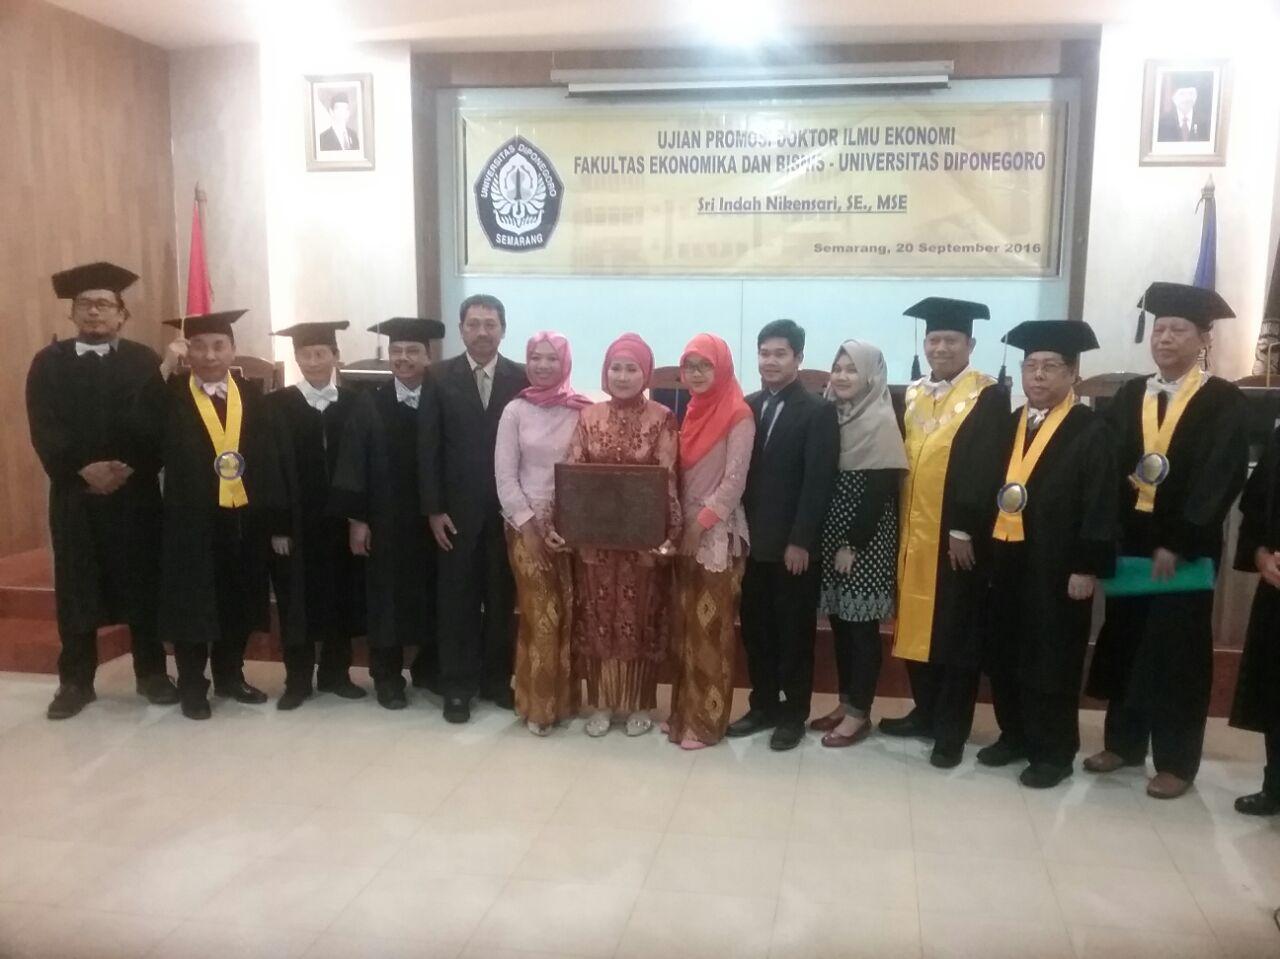 Sidang Promosi Doktor dalam Ilmu Ekonomi Sri Indah Nikensari, SE, M. SE